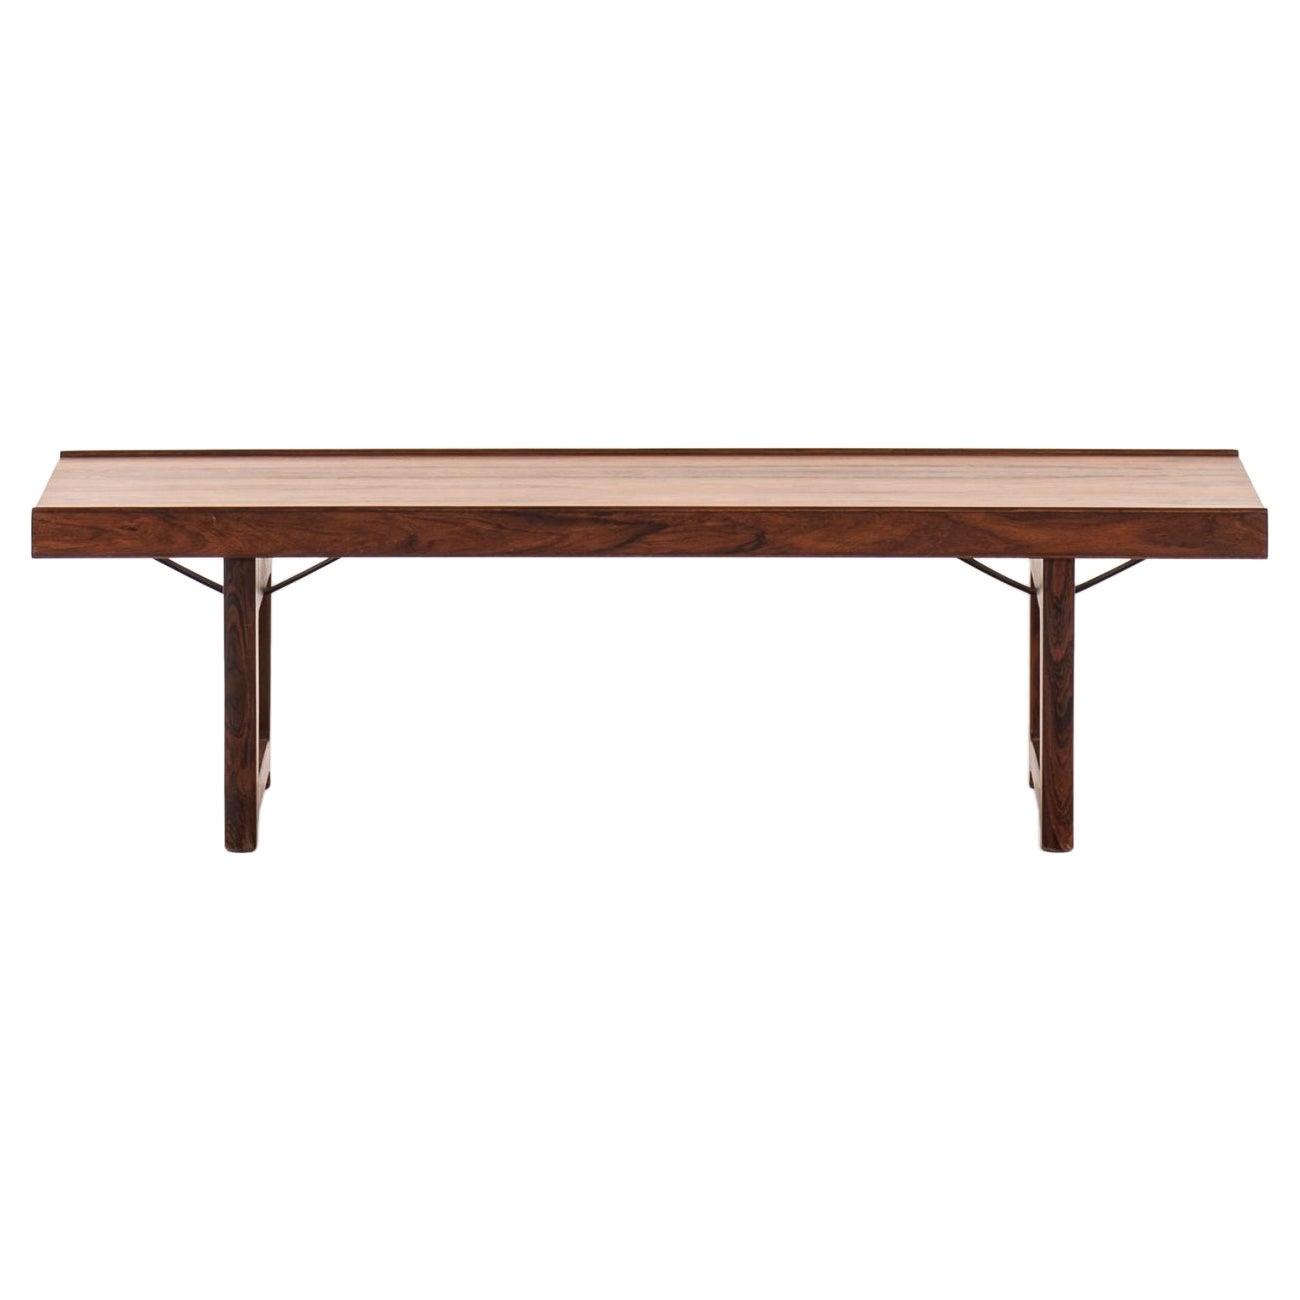 Torbjørn Afdal Bench / Side Table Model Krobo Produced by Bruksbo in Norway